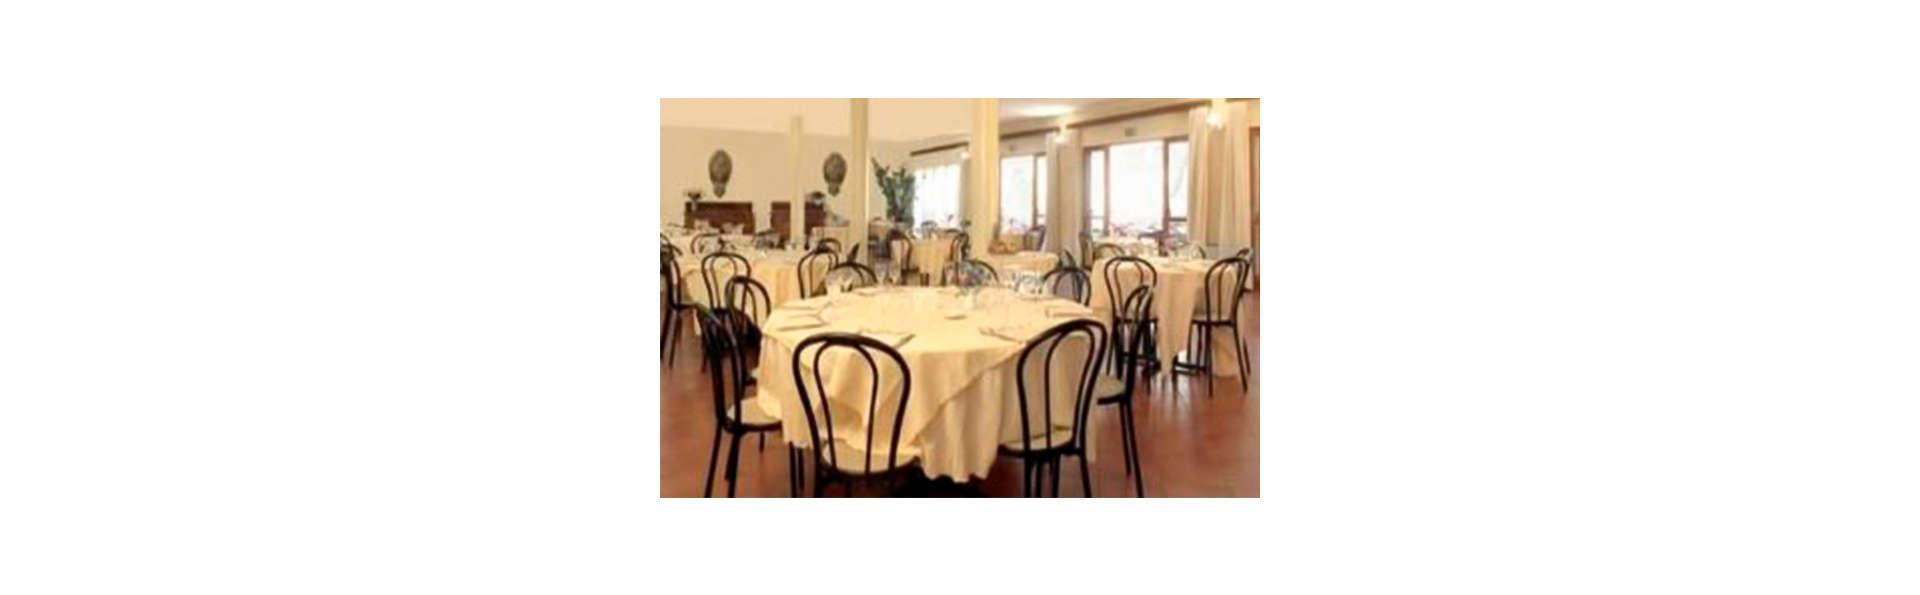 Hotel Carignano - EDIT_RESTAURANT_01.jpg